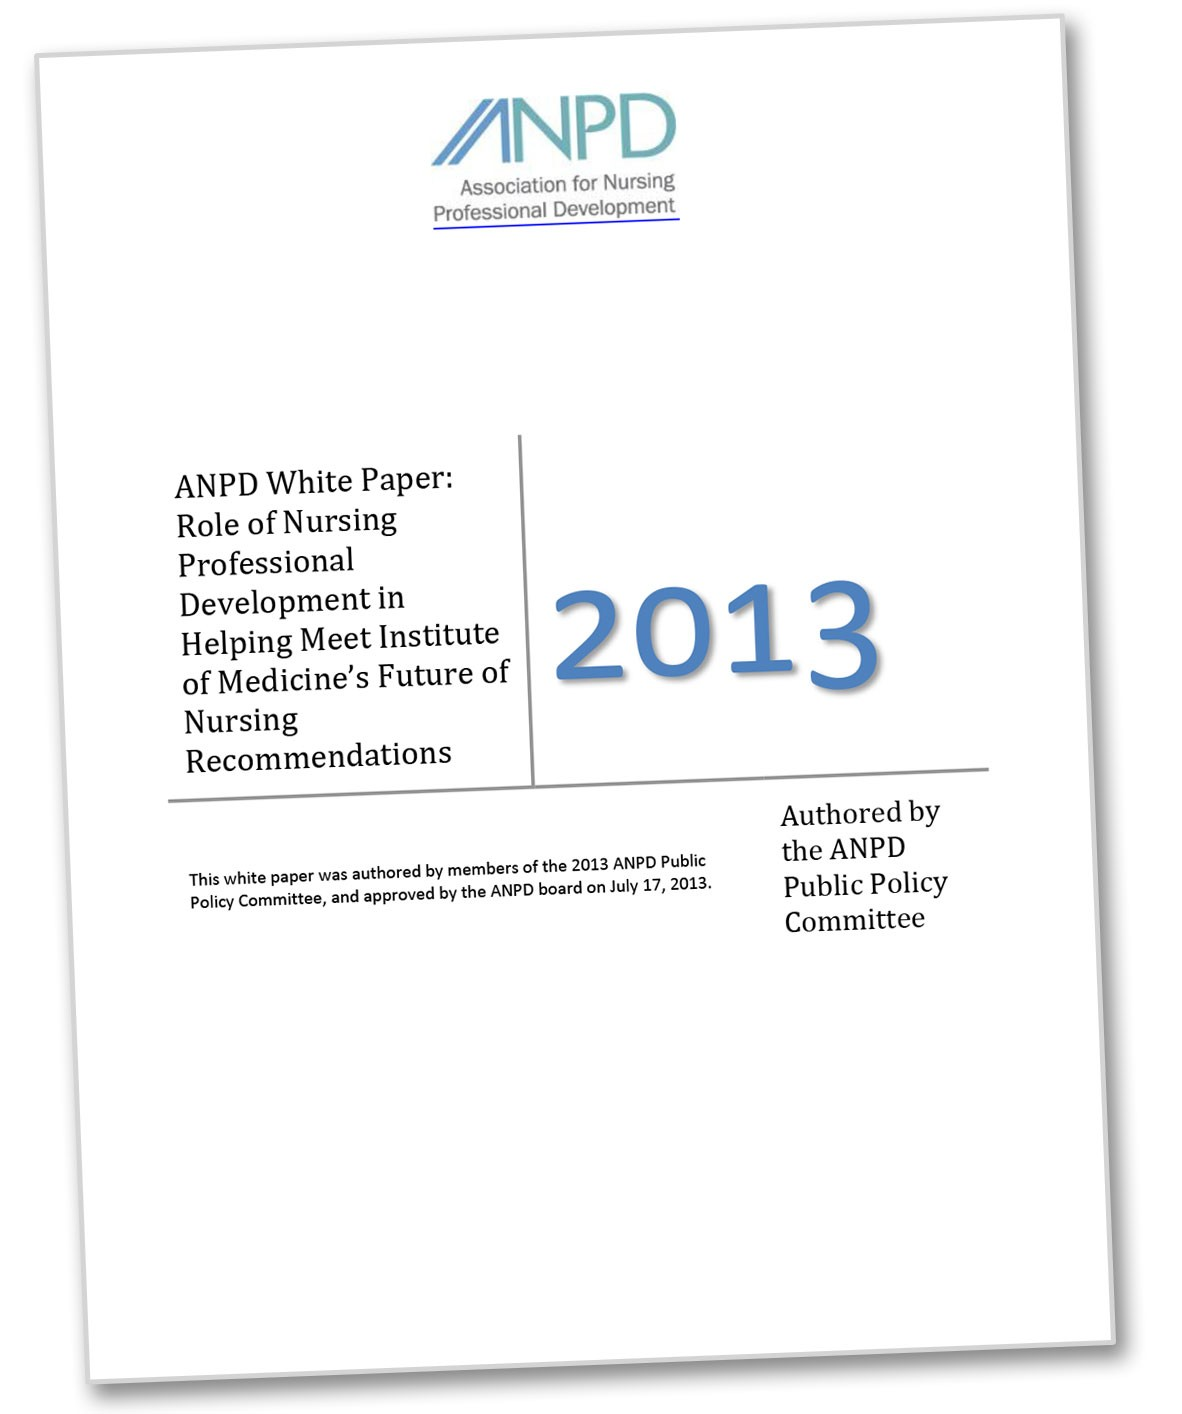 Role of Nursing Professional Development in Helping Meet Institute of Medicine's Future of Nursing Recommendations